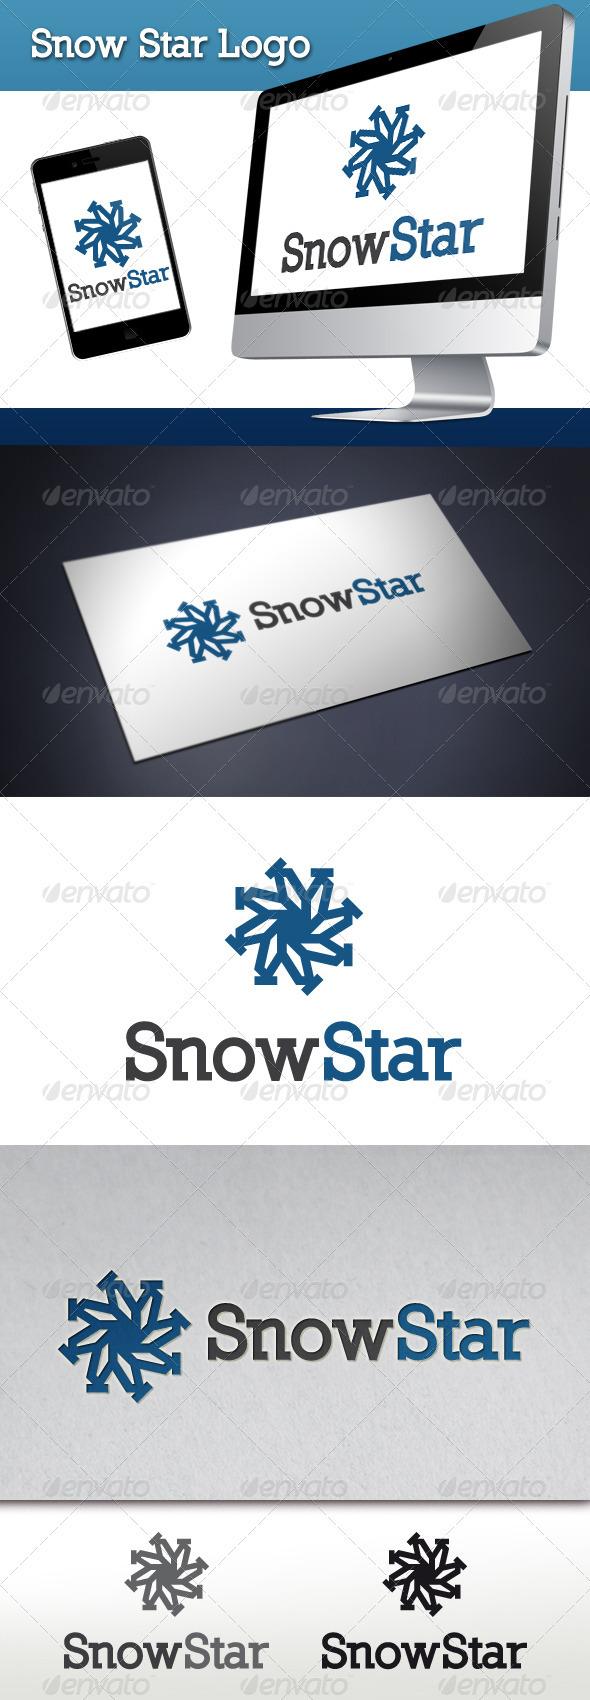 Snow Star Logo Template - Symbols Logo Templates